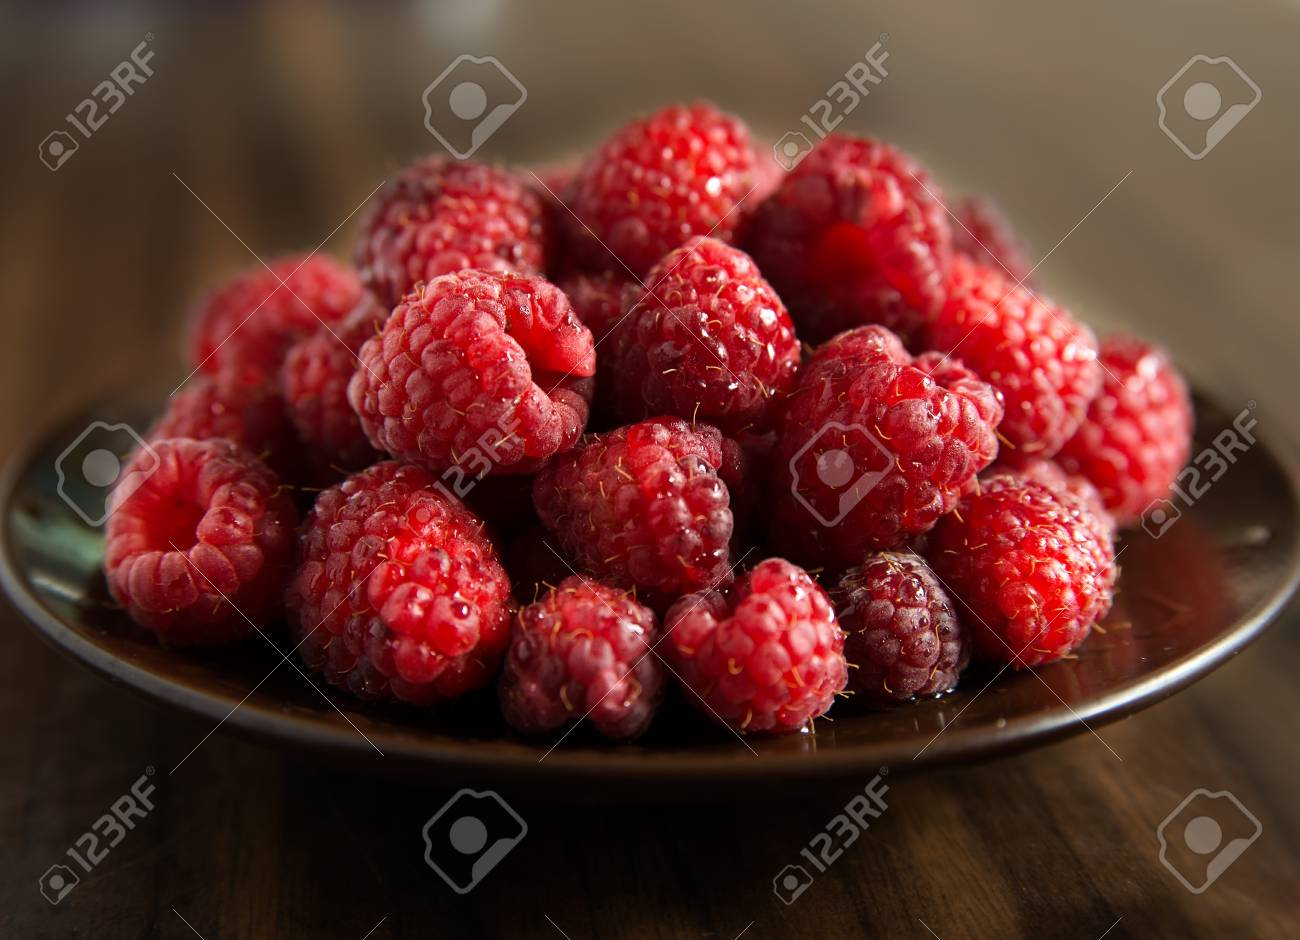 Fresh raspberries on brown plate, dark background, selective focus Stock Photo - 18574983